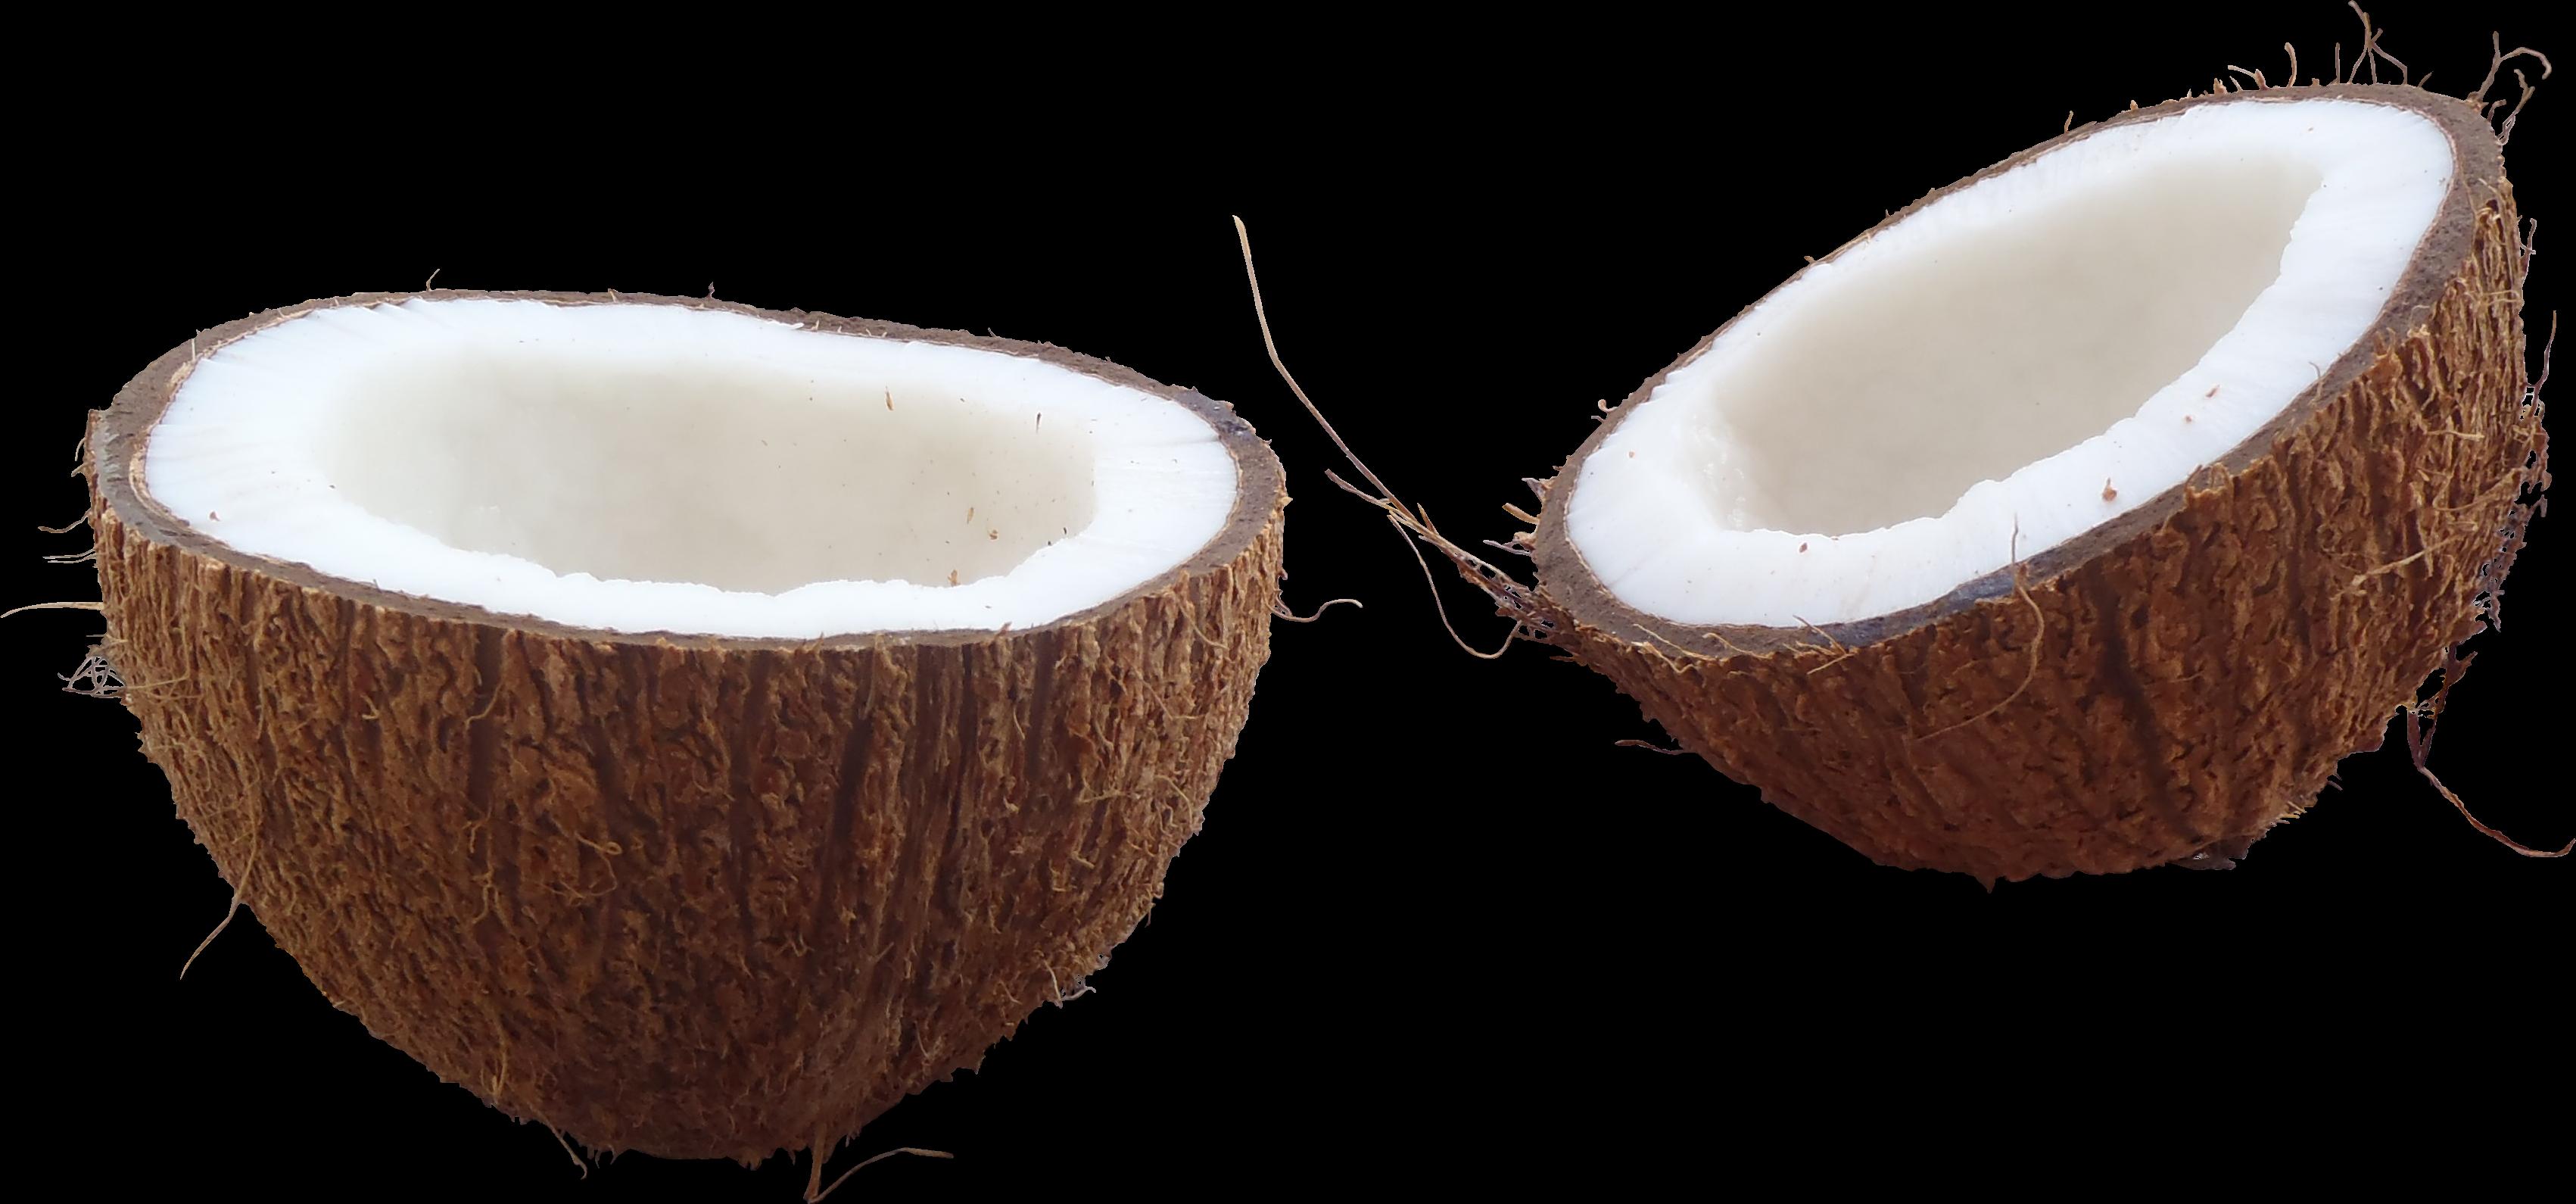 Coconut clipart coconut milk. Png transparent images all